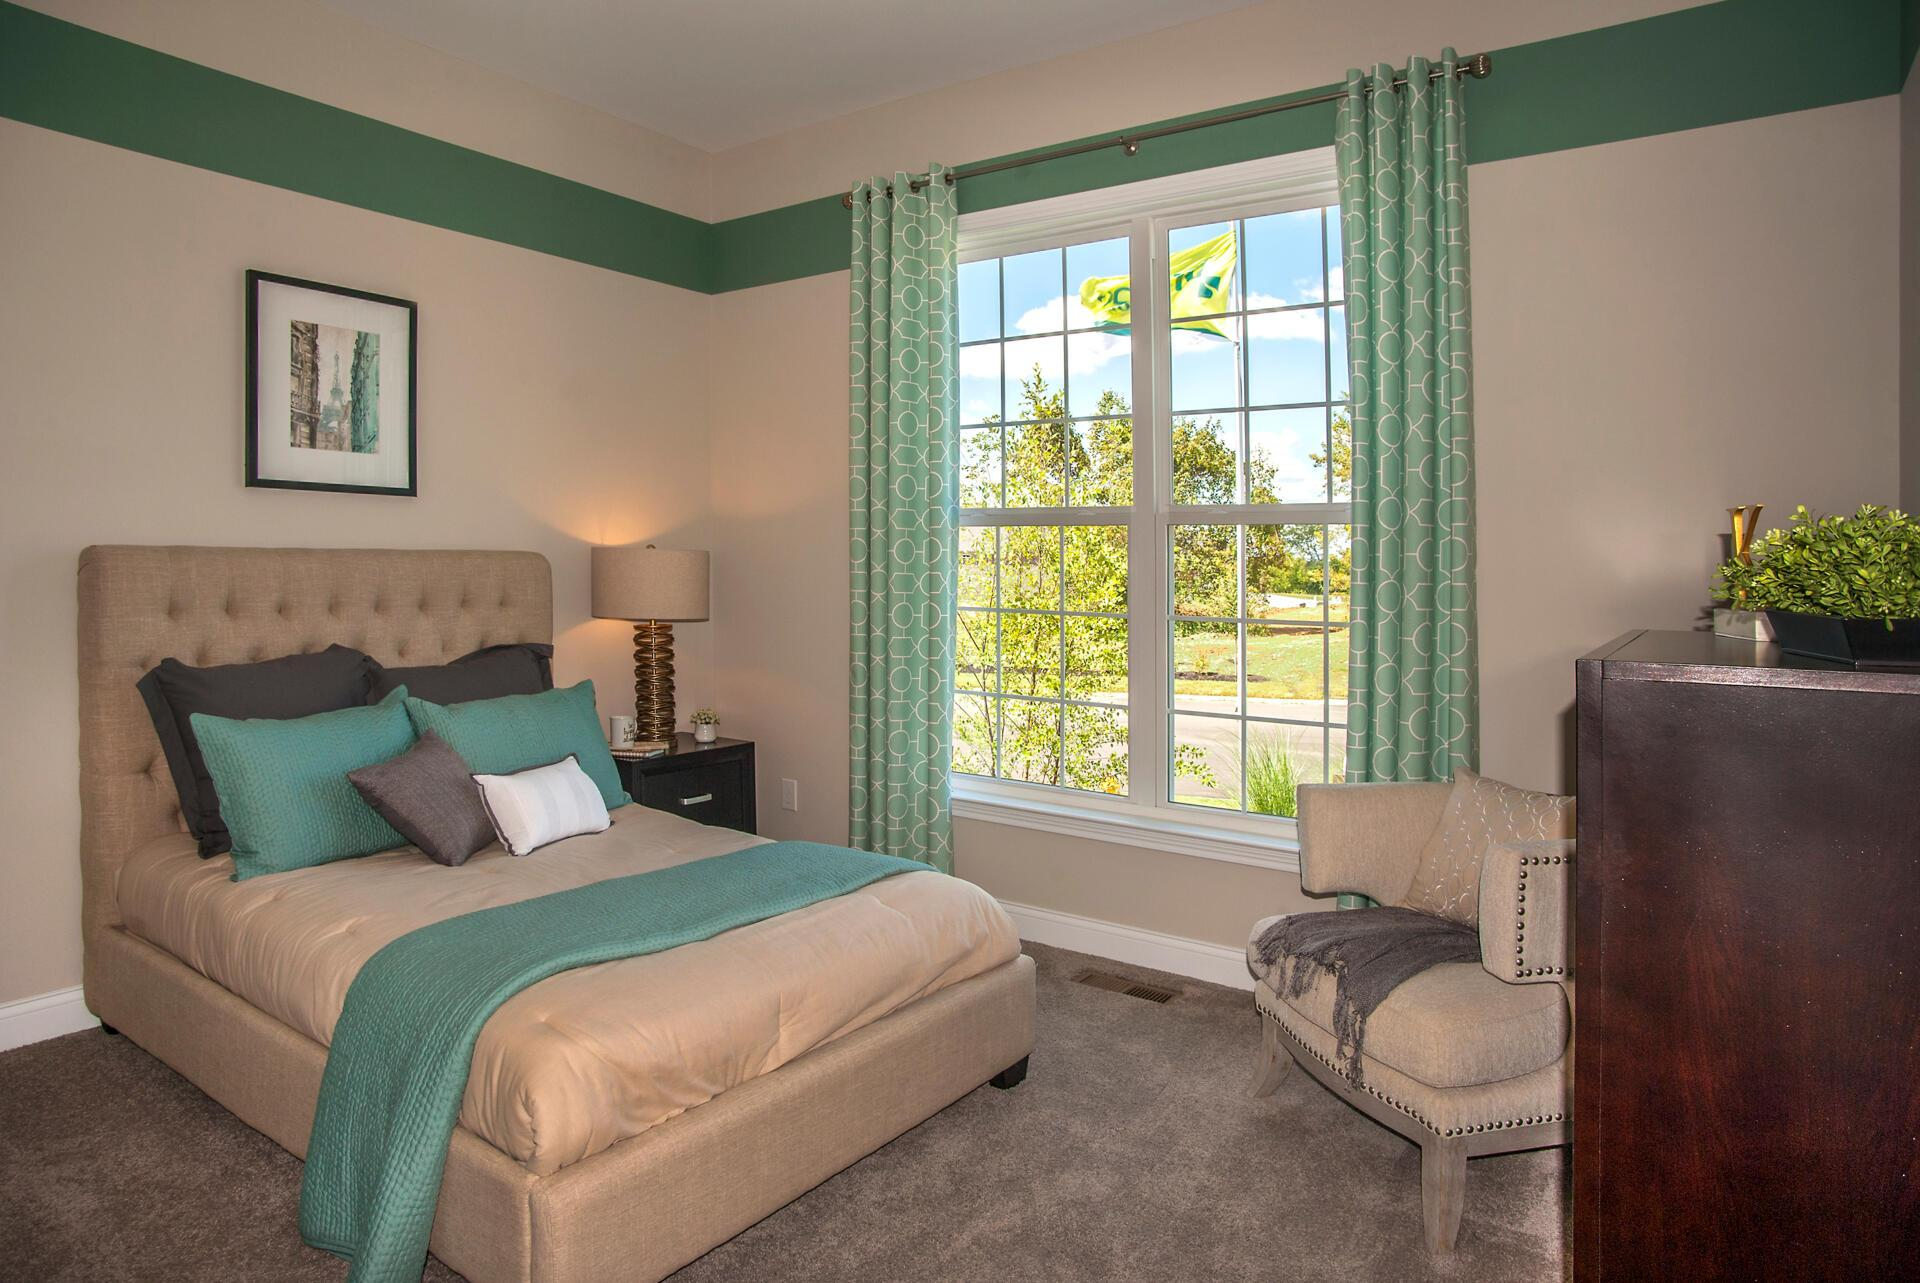 Bedroom featured in the Naples By Drees Homes in Cincinnati, KY